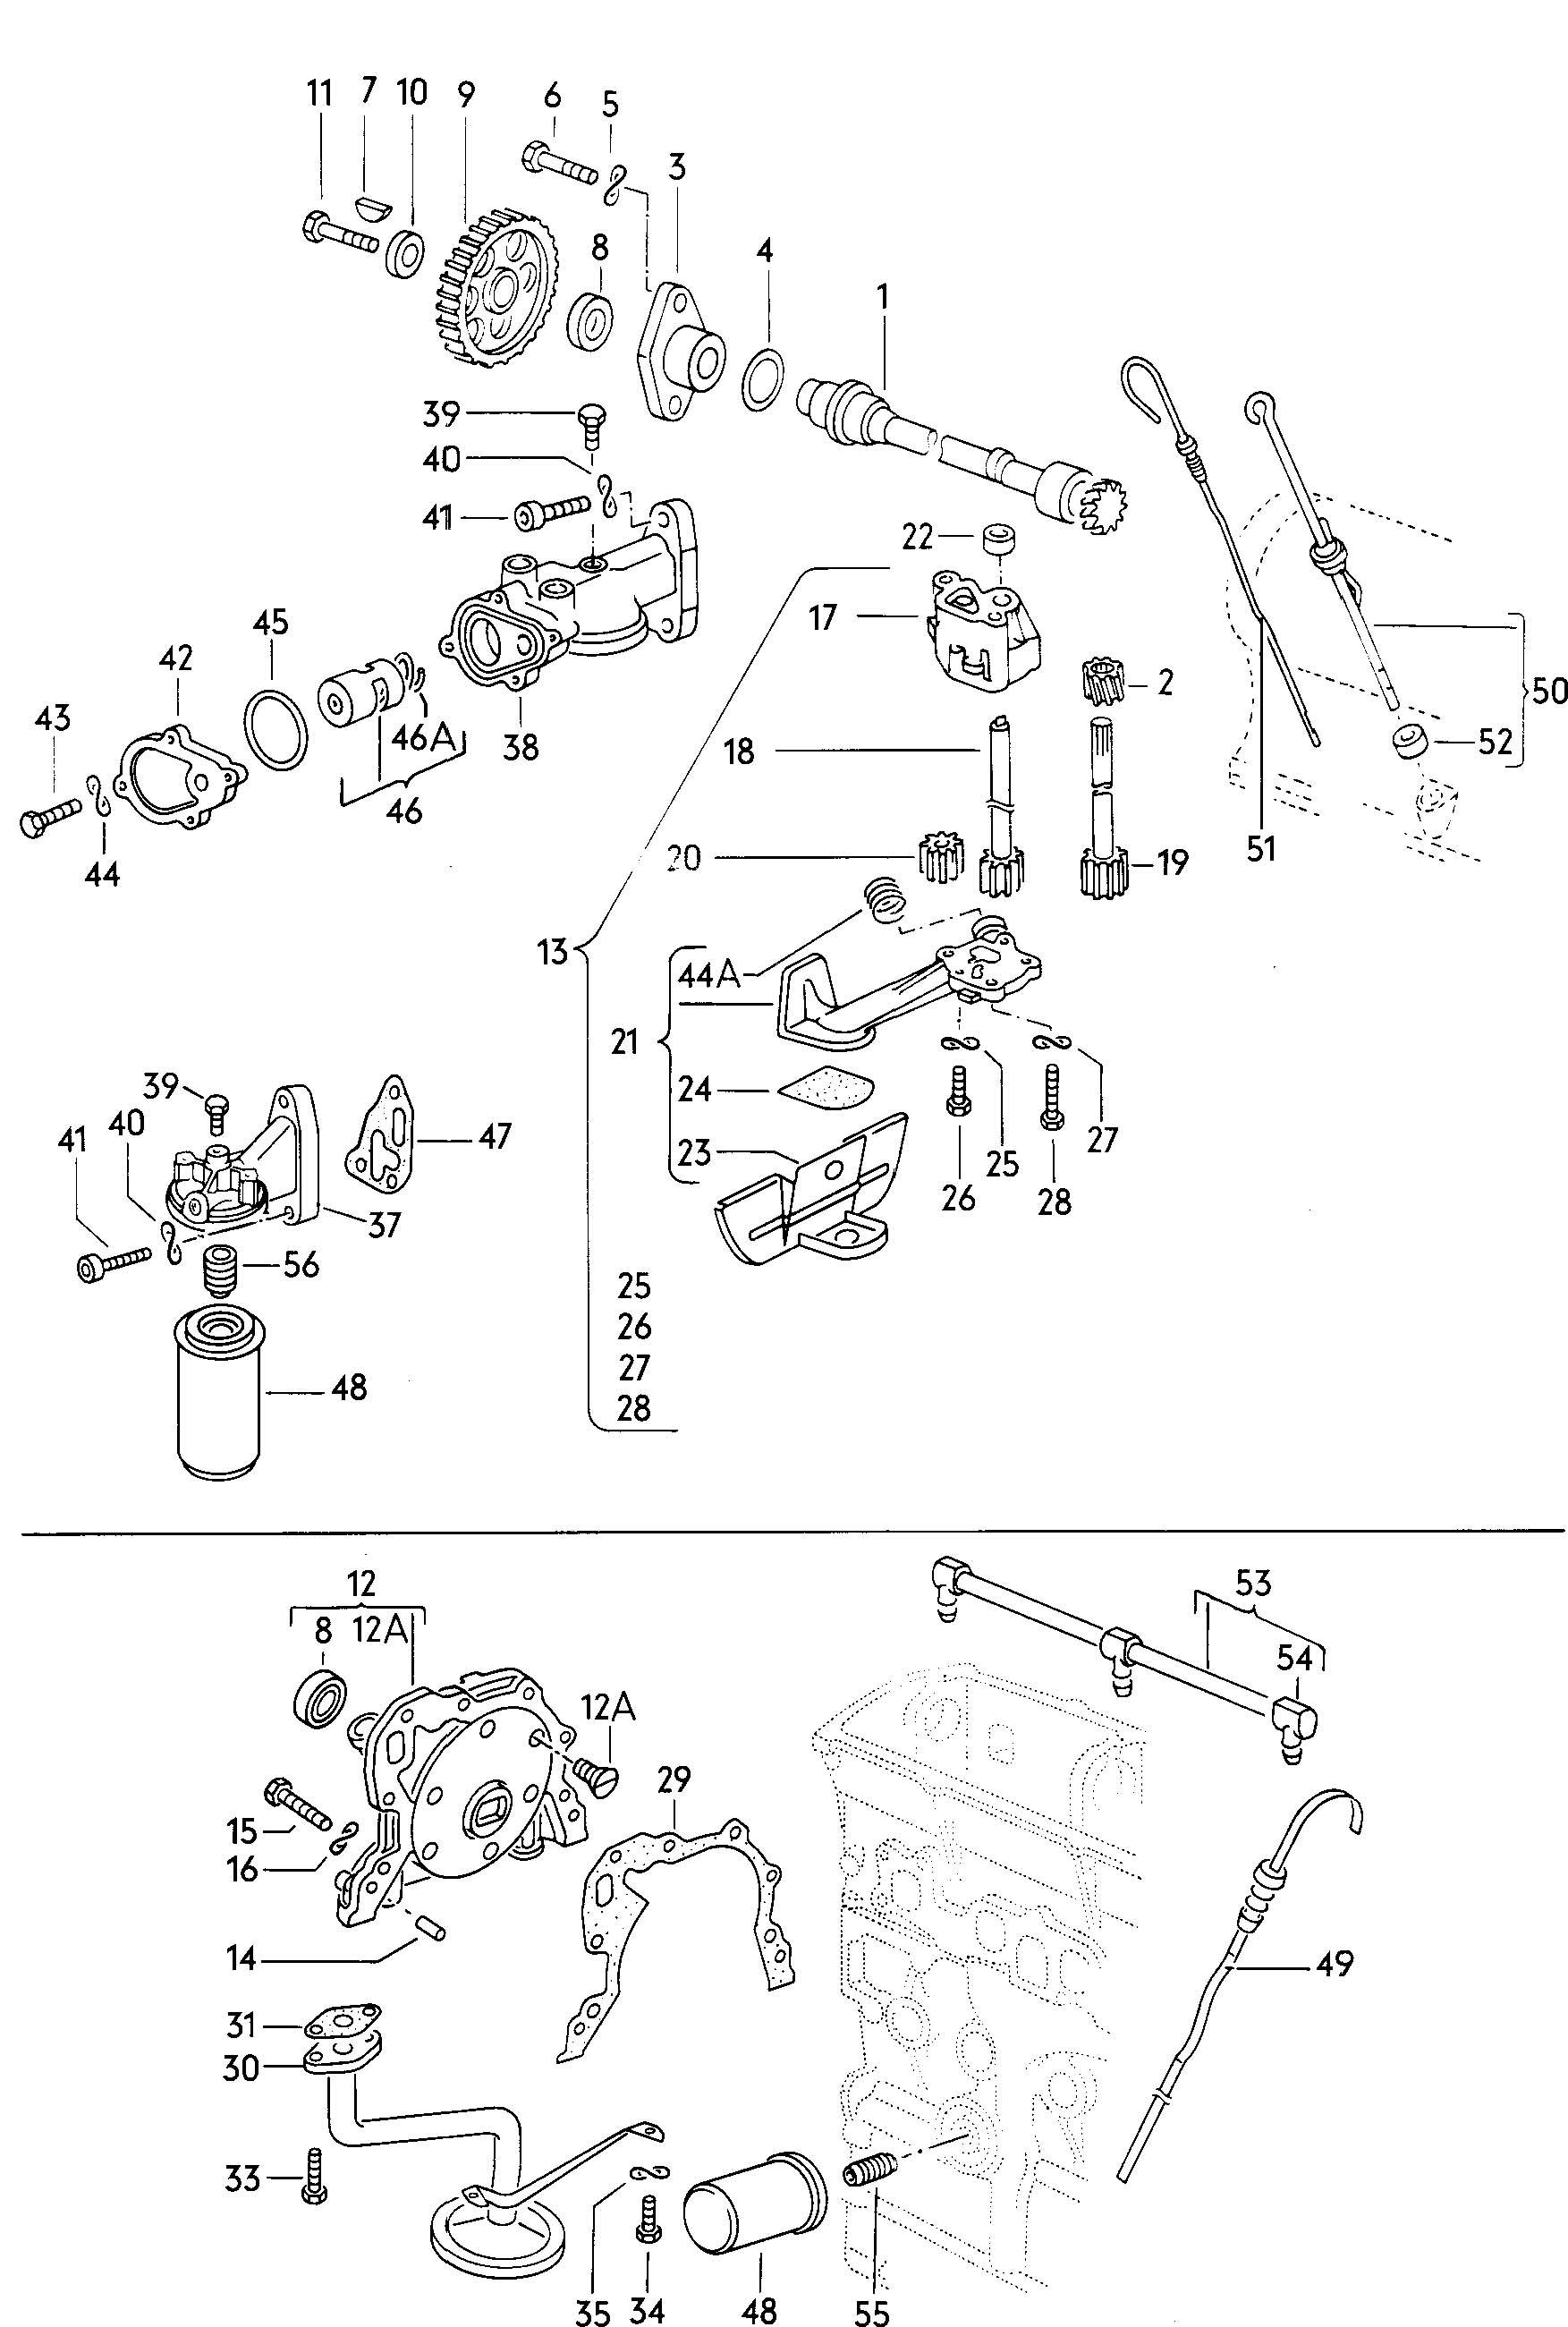 Shift mechanism for 5 speed manual transmiss.